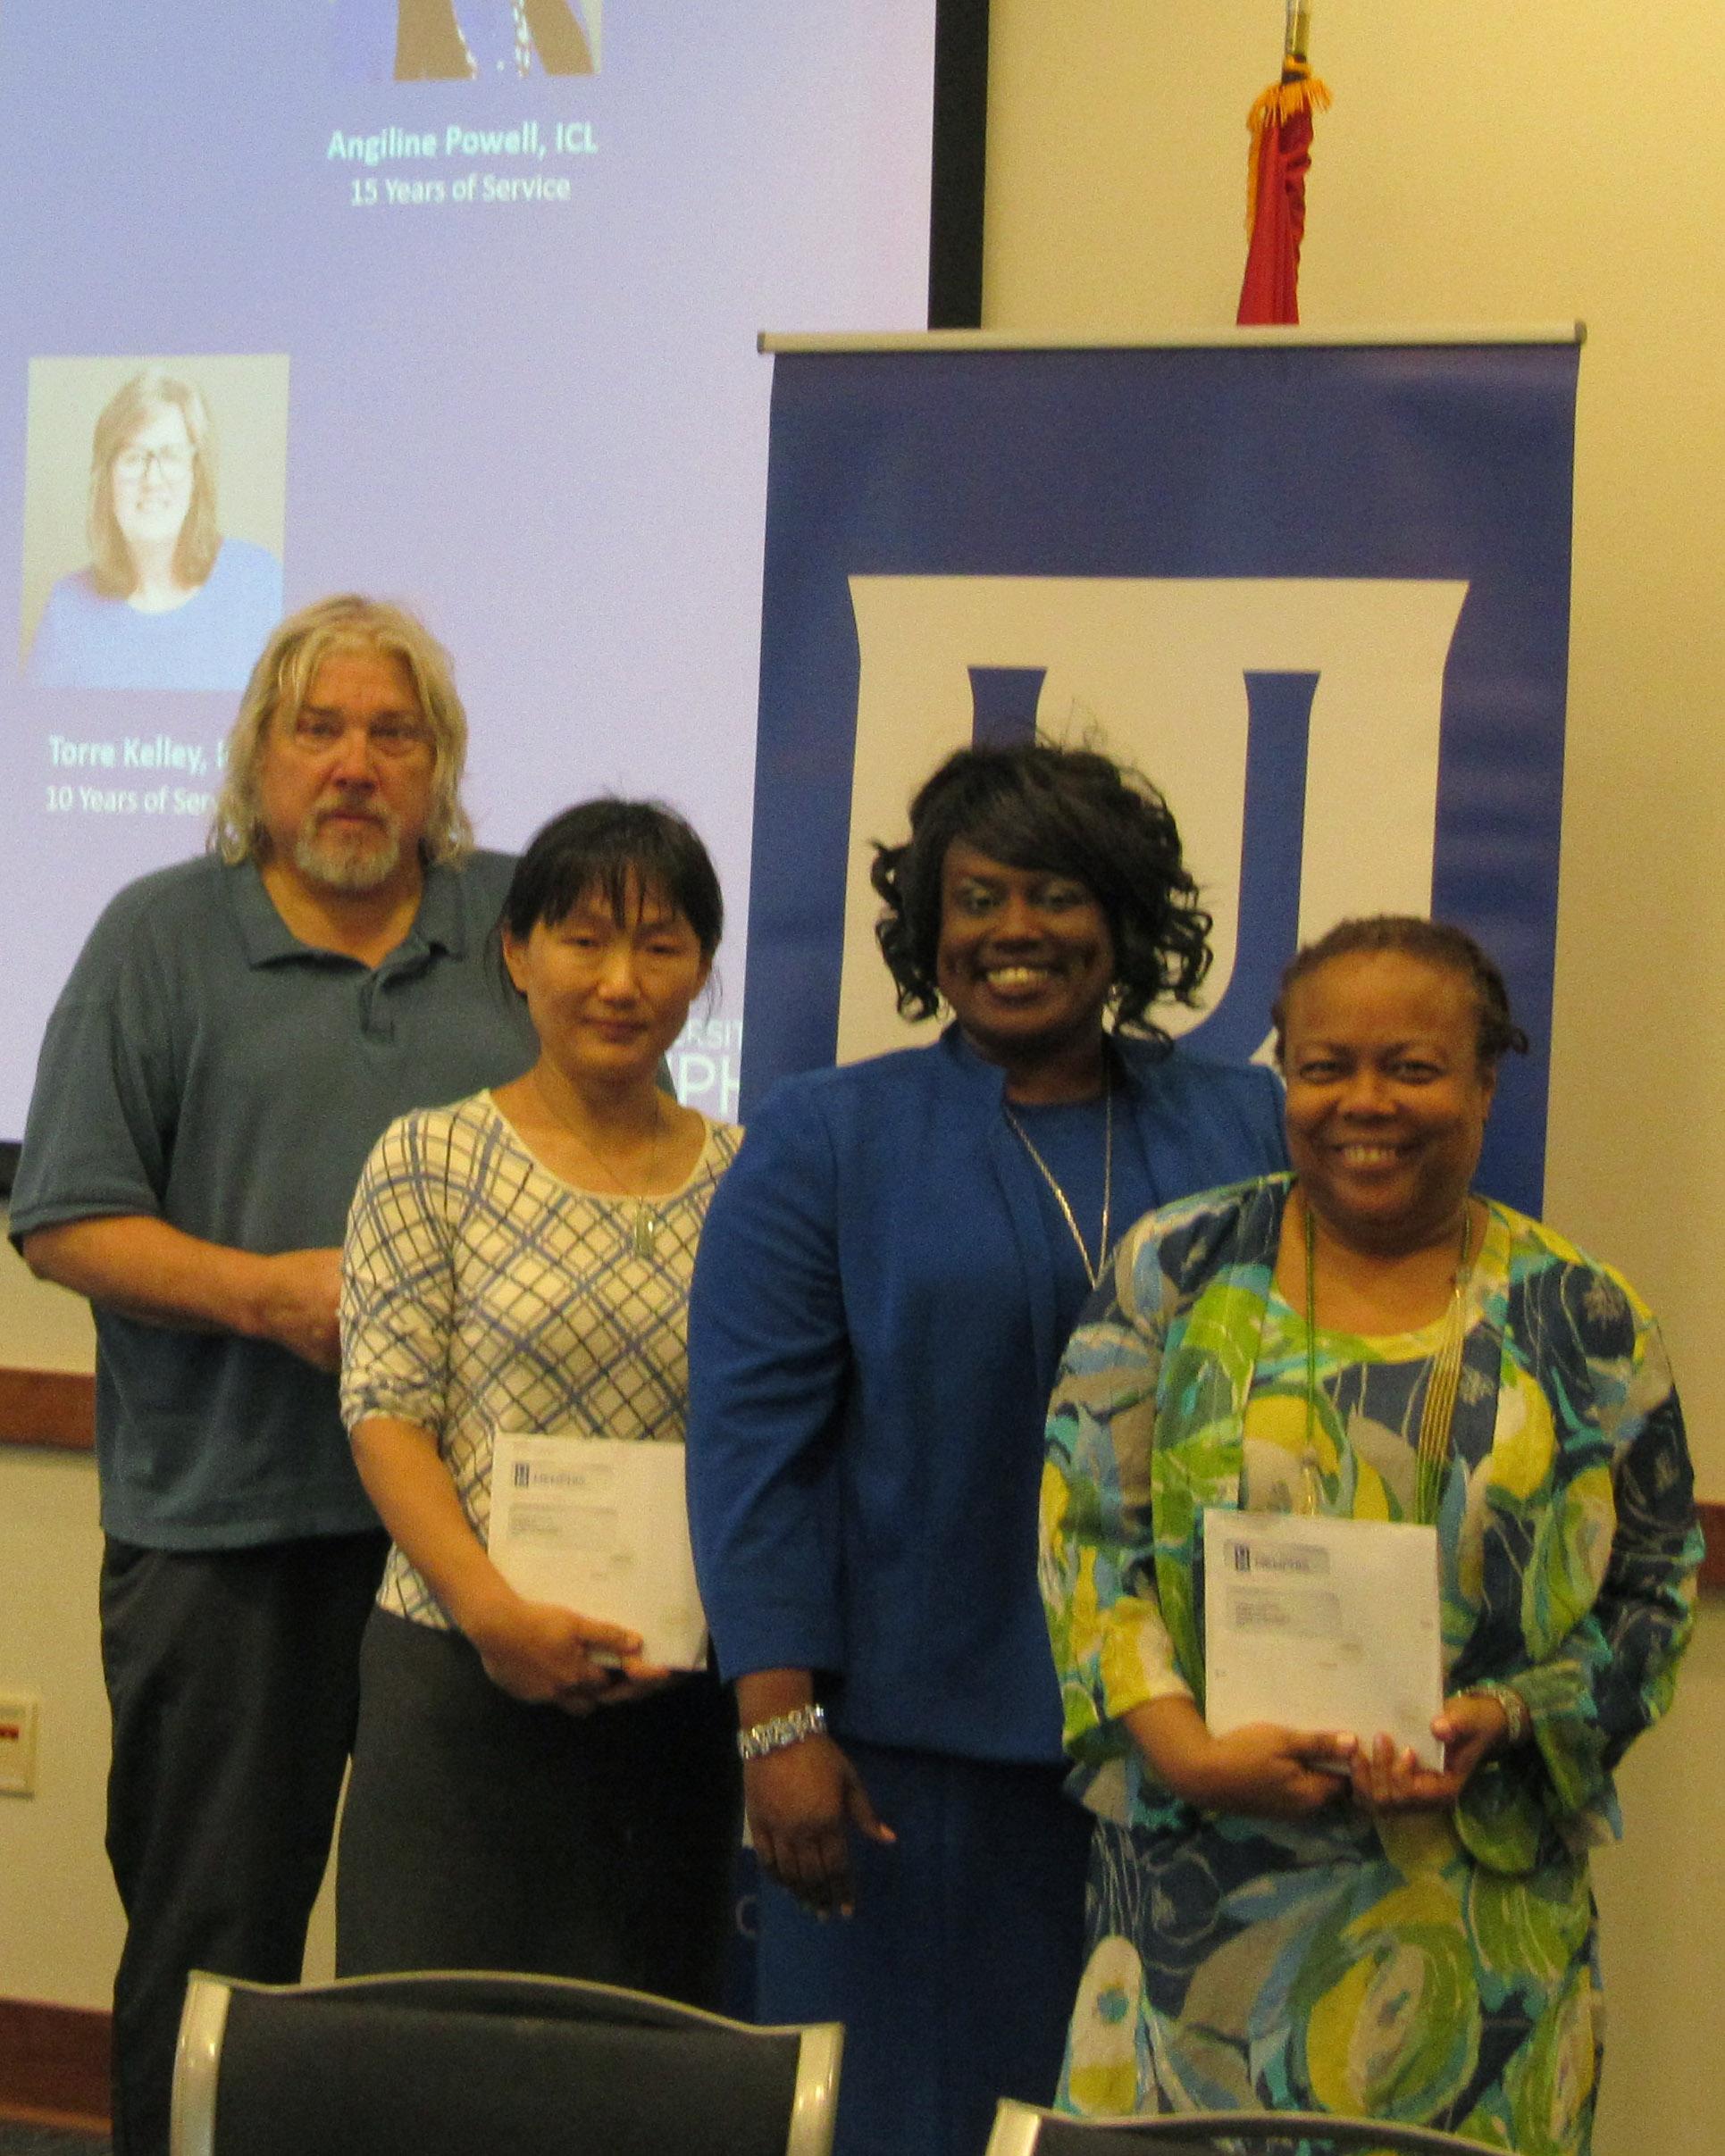 Faculty Career Milestone award winners with Dean Hill-Clarke